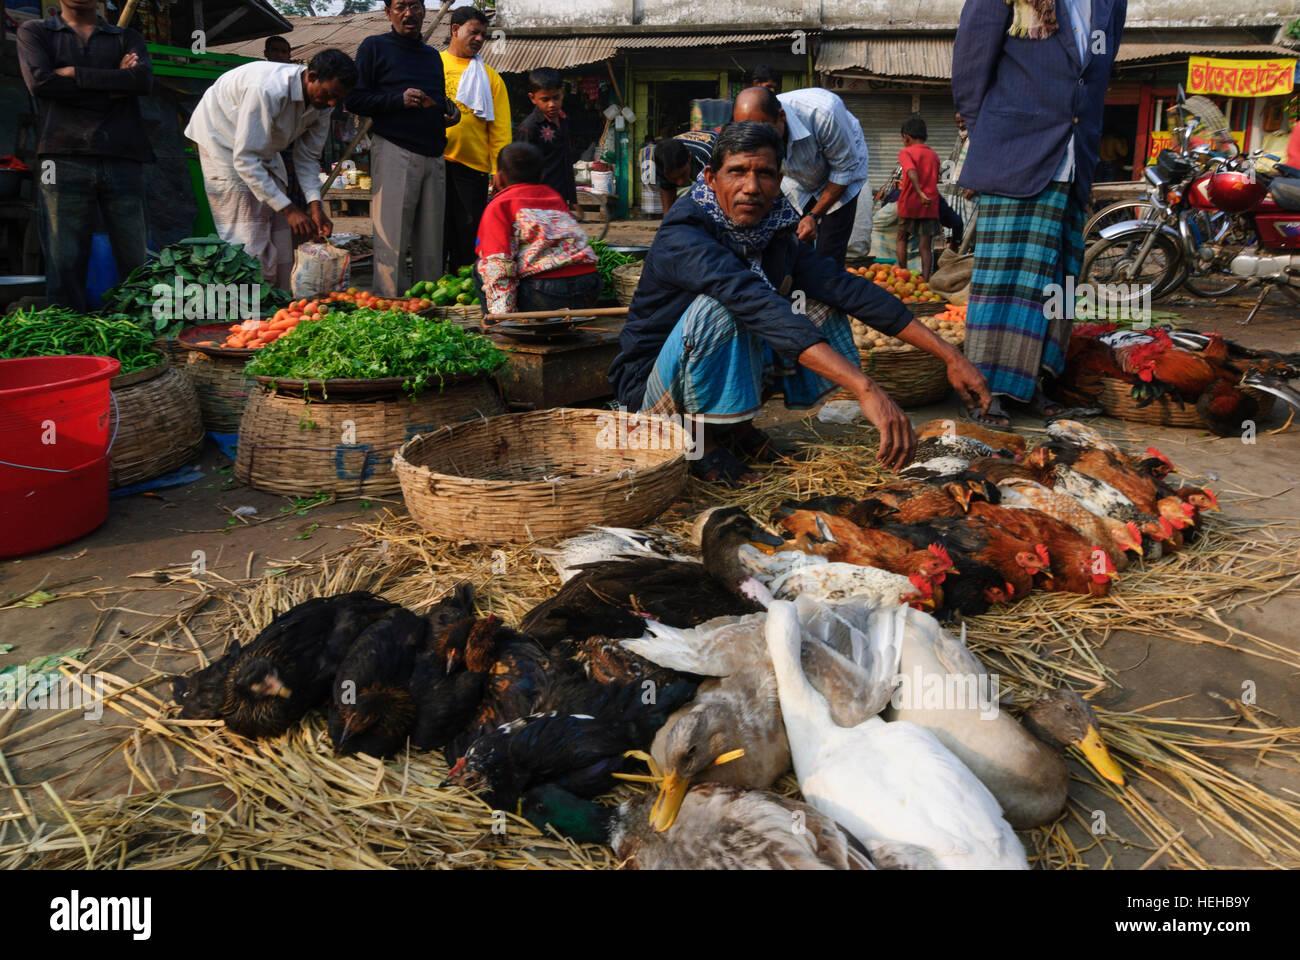 Barisal: Market, poultry, chickens, Barisal Division, Bangladesh - Stock Image